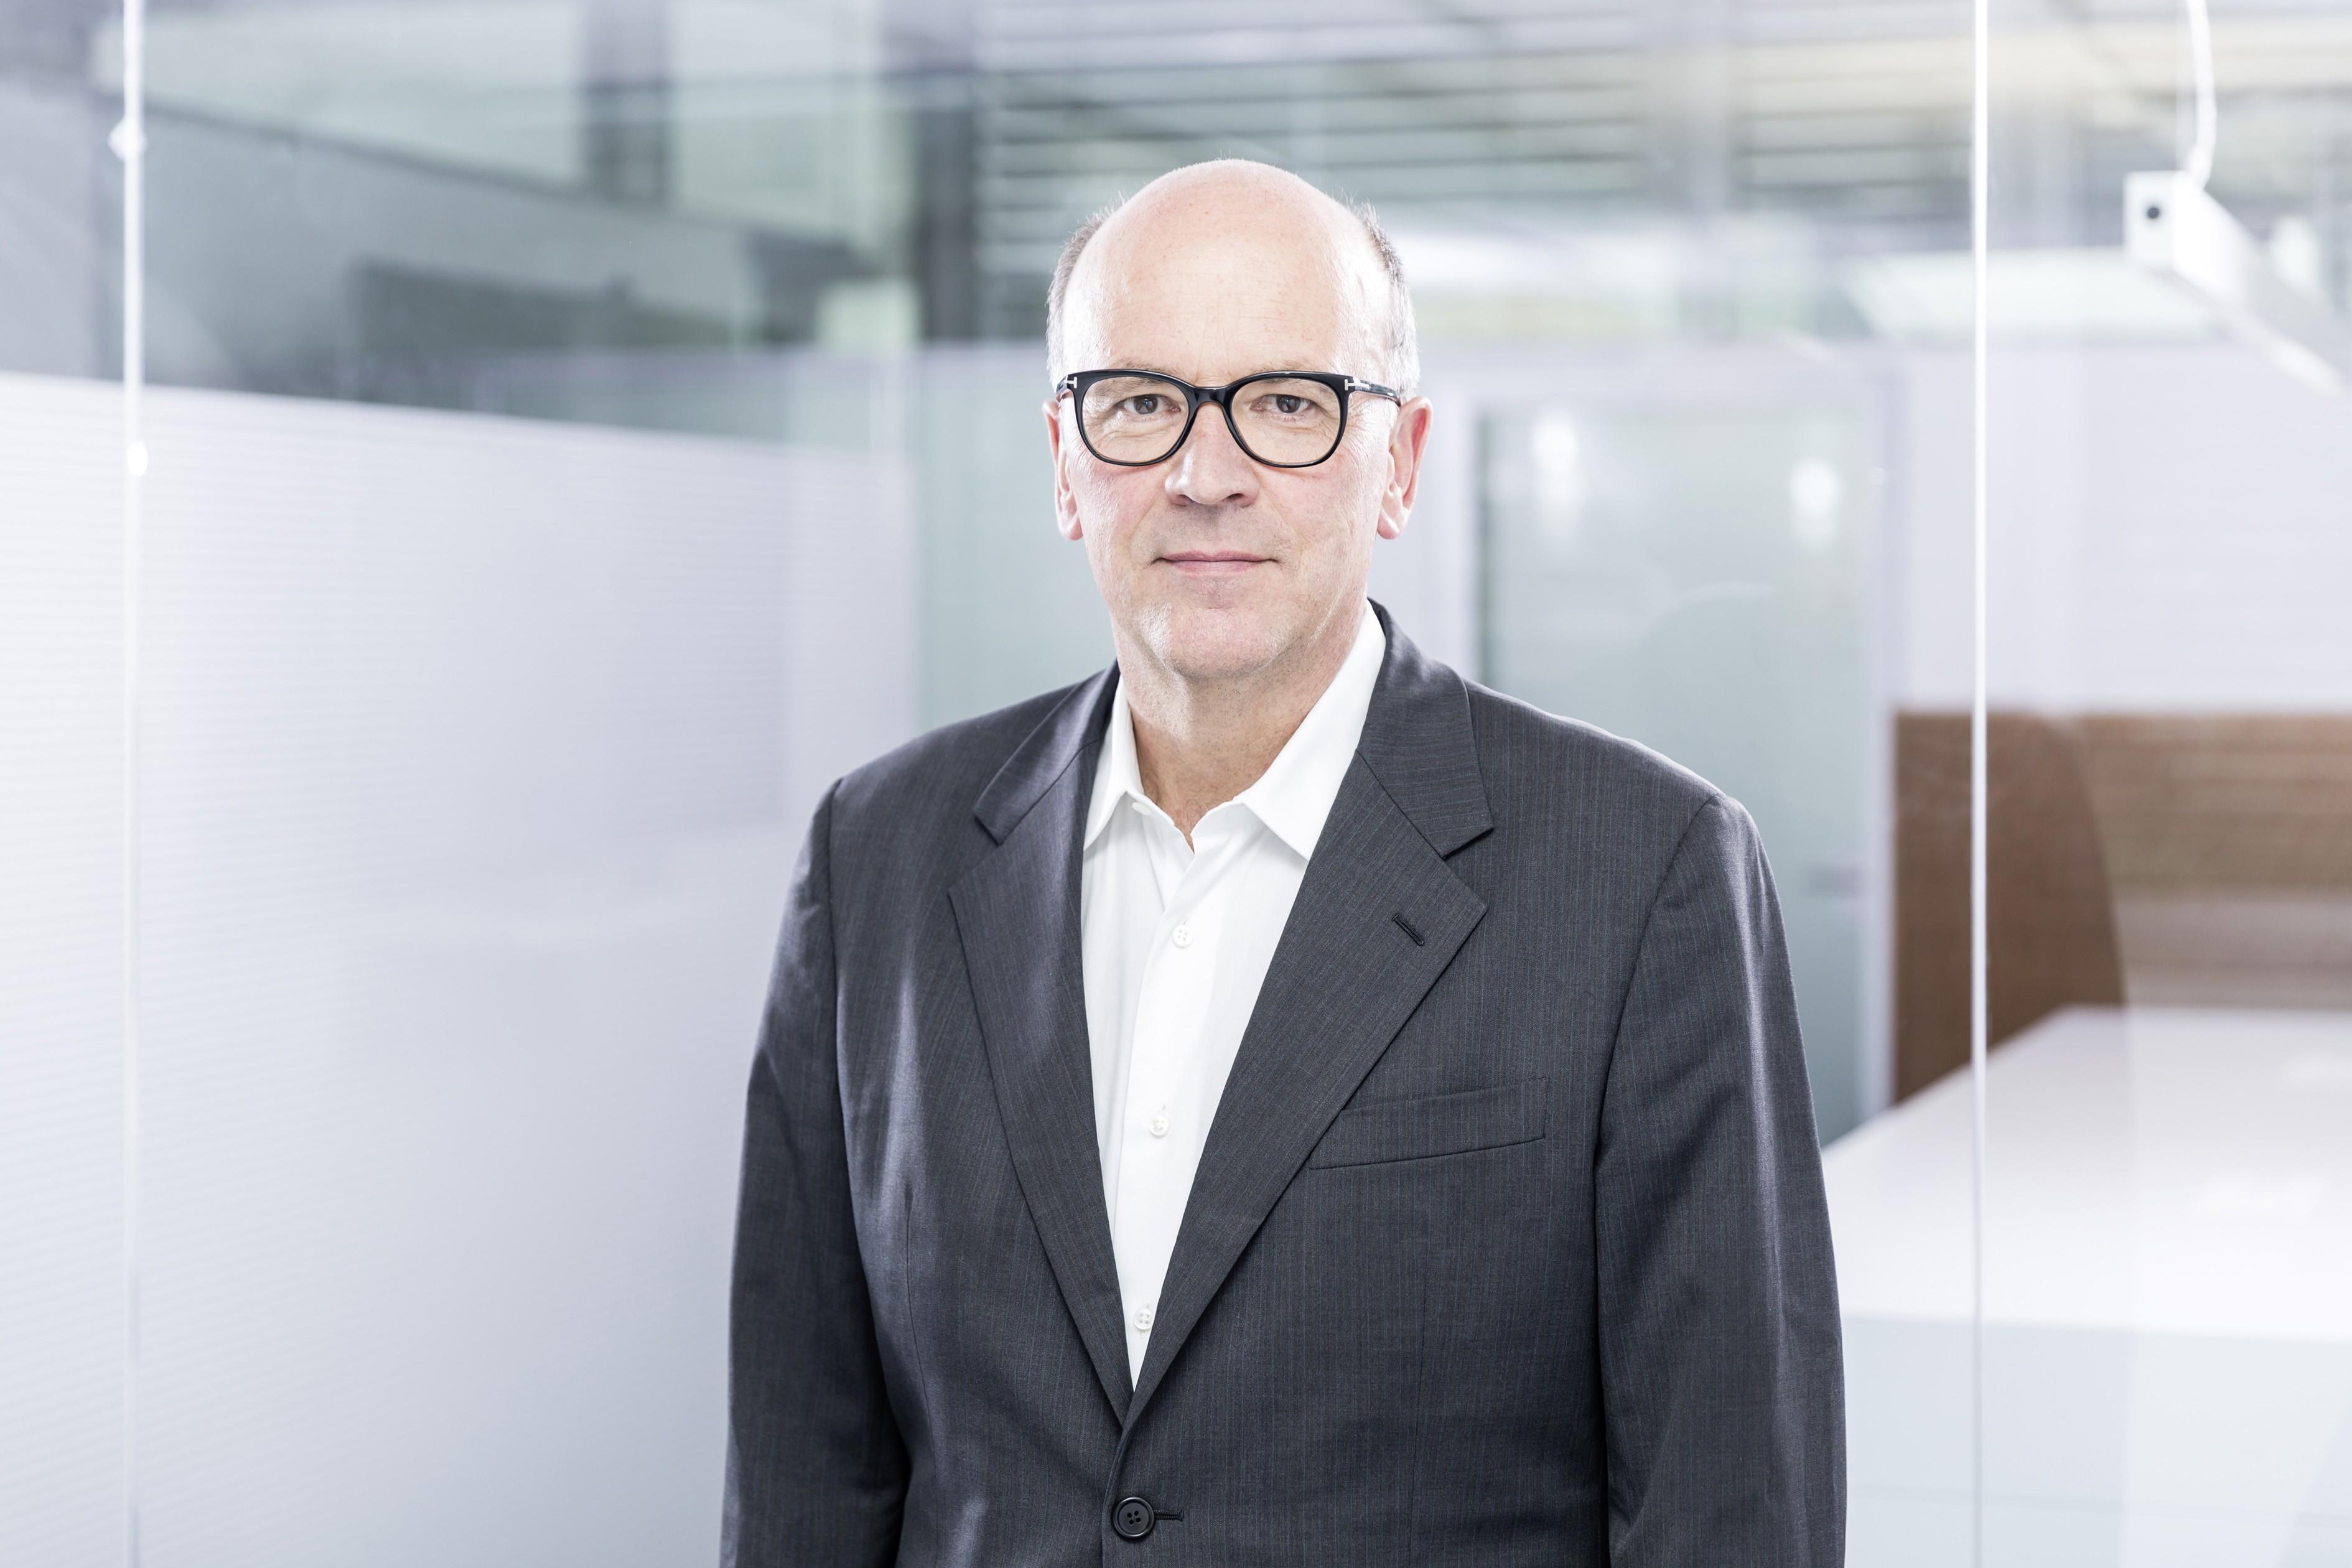 Elmar Rottkamp<br><span class='image_copyright'>ATP/Becker</span><br>